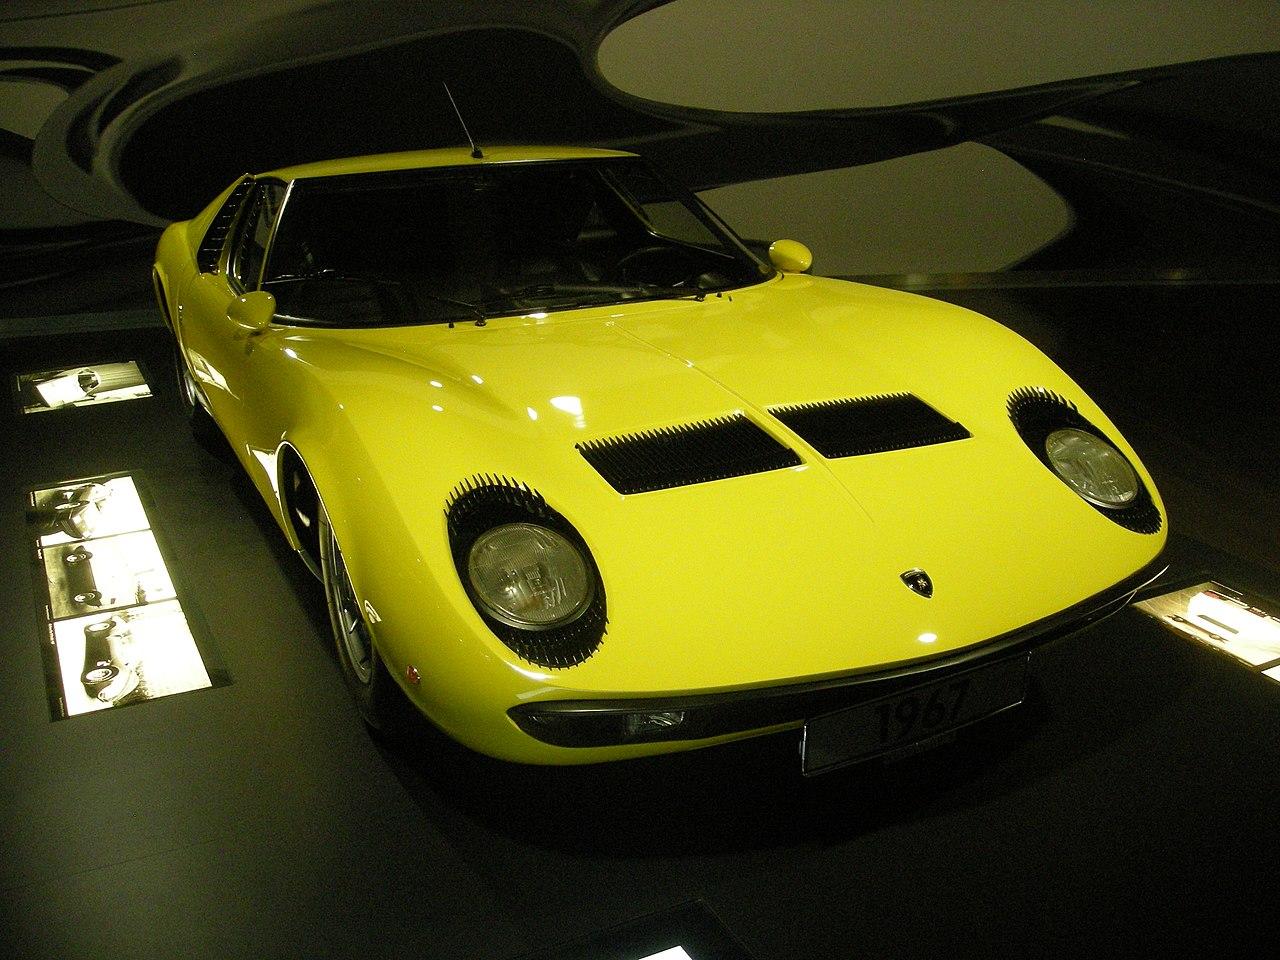 1280px-Wolfsburg_Jun_2012_121_(Autostadt_-_1967_Lamborghini_Miura).jpg